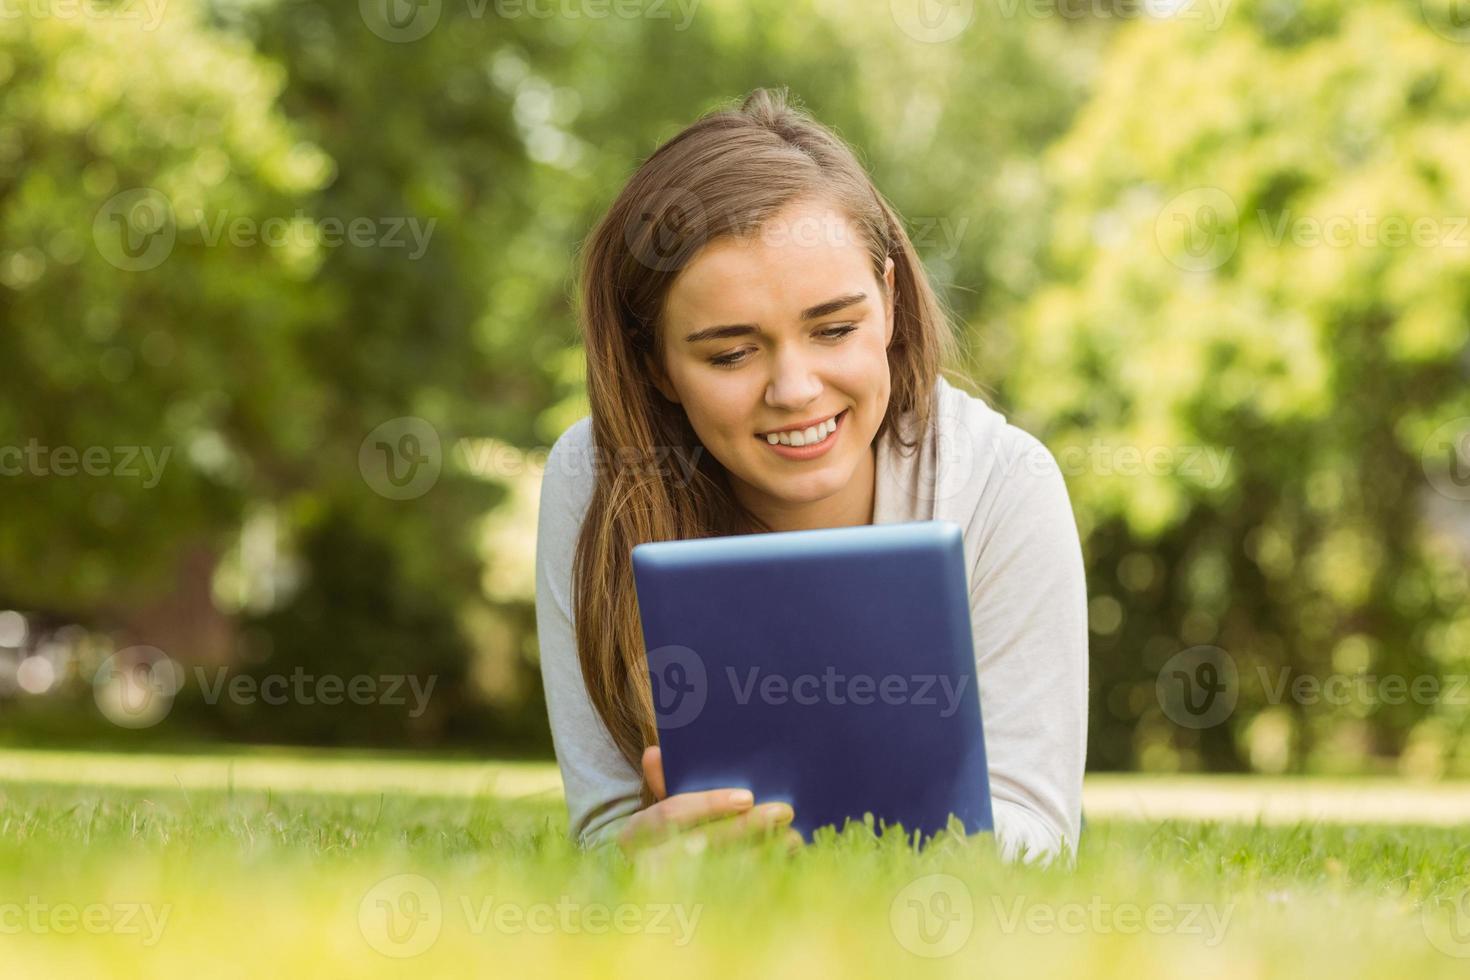 studente universitario sorridente sdraiato e utilizzando tablet pc foto